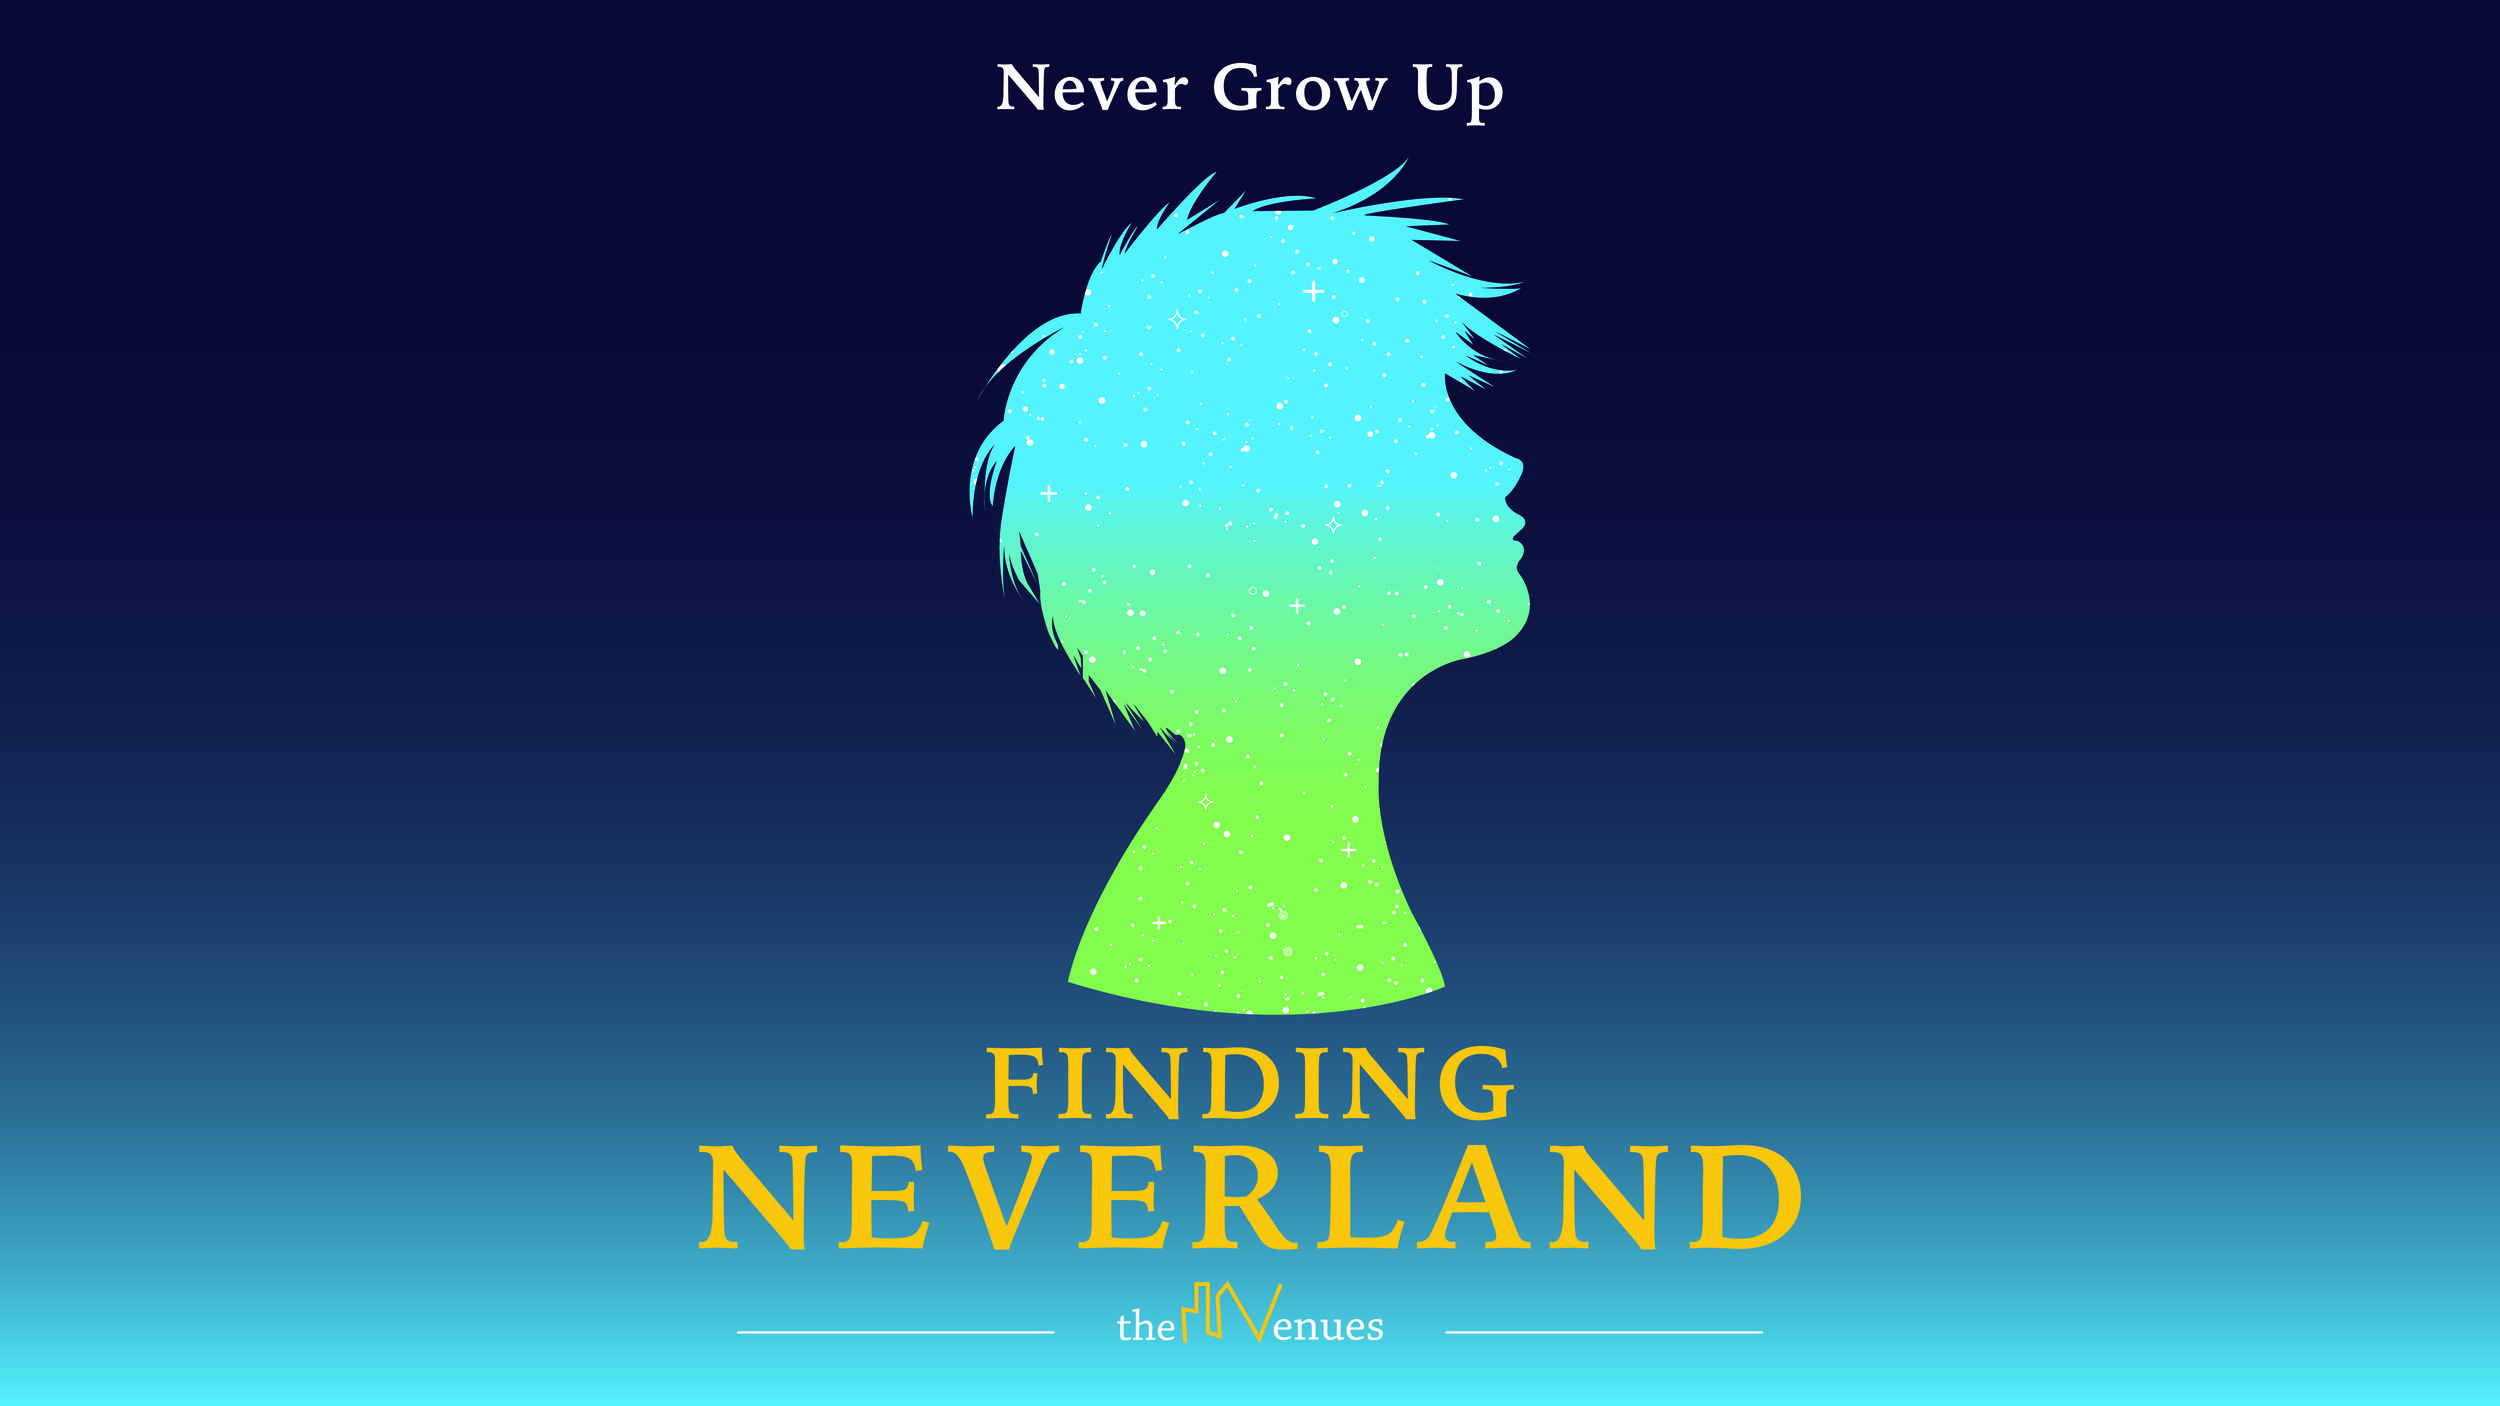 FindingNeverland-01.jpg